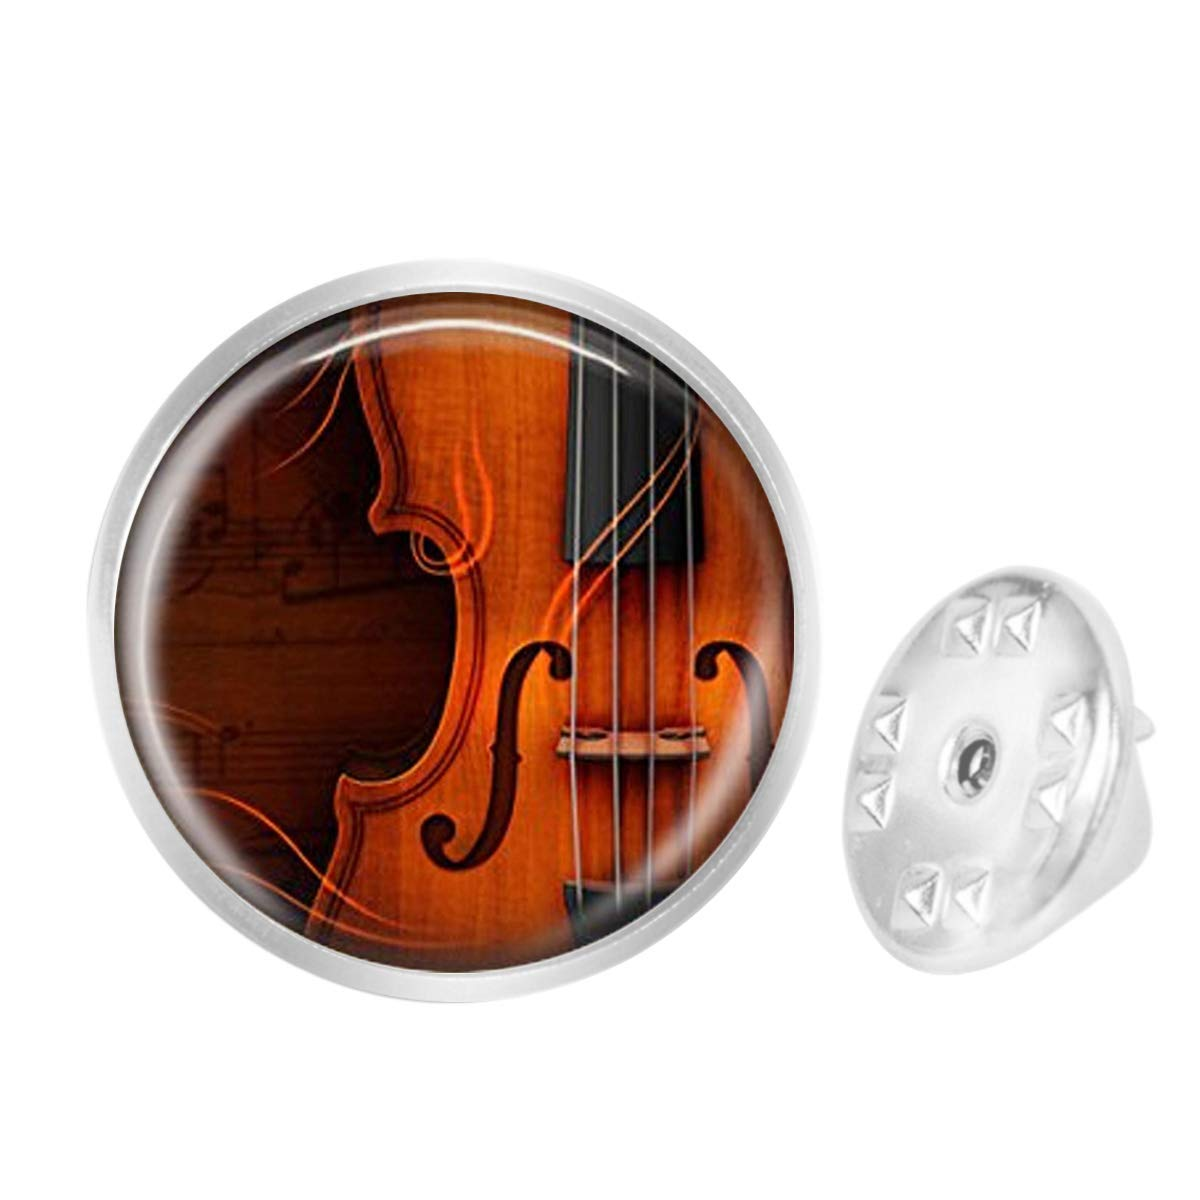 WAZZIT Round Metal Tie Tack Hat Lapel Pin Brooches Violin Instrument Music Banquet Badge Enamel Pins Trendy Accessory Jacket T-Shirt